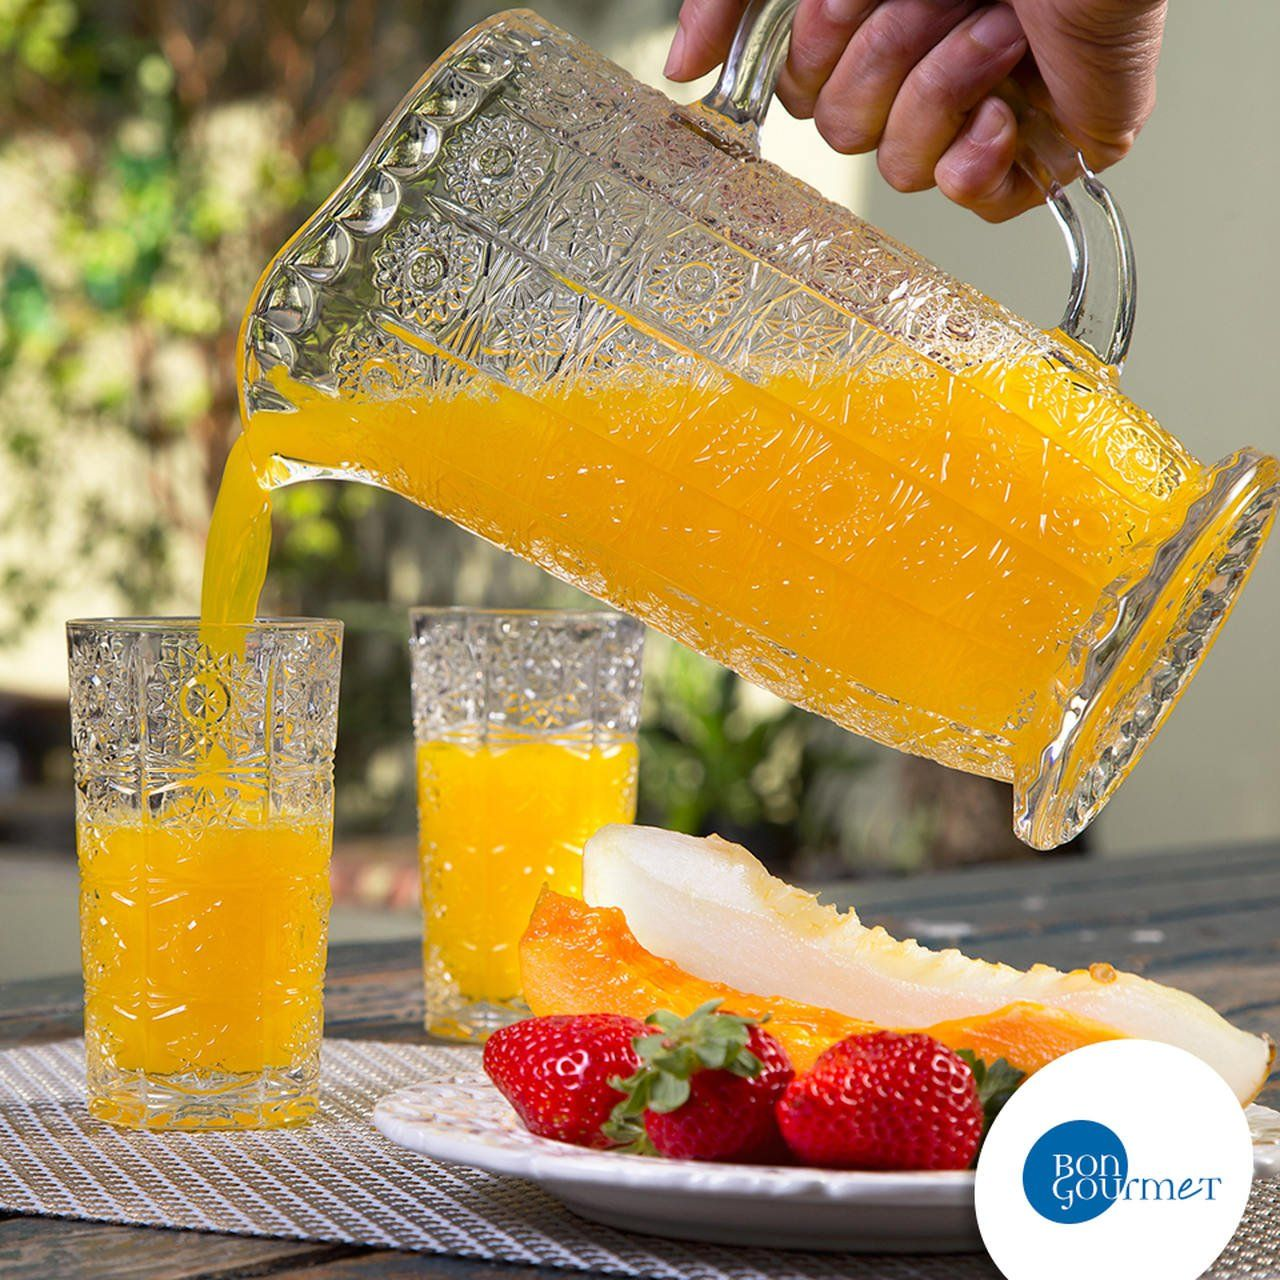 Conjunto Jarra 1,38 litros + 6 copos 260ml de vidro transparente Starry Bon Gourmet - 25817